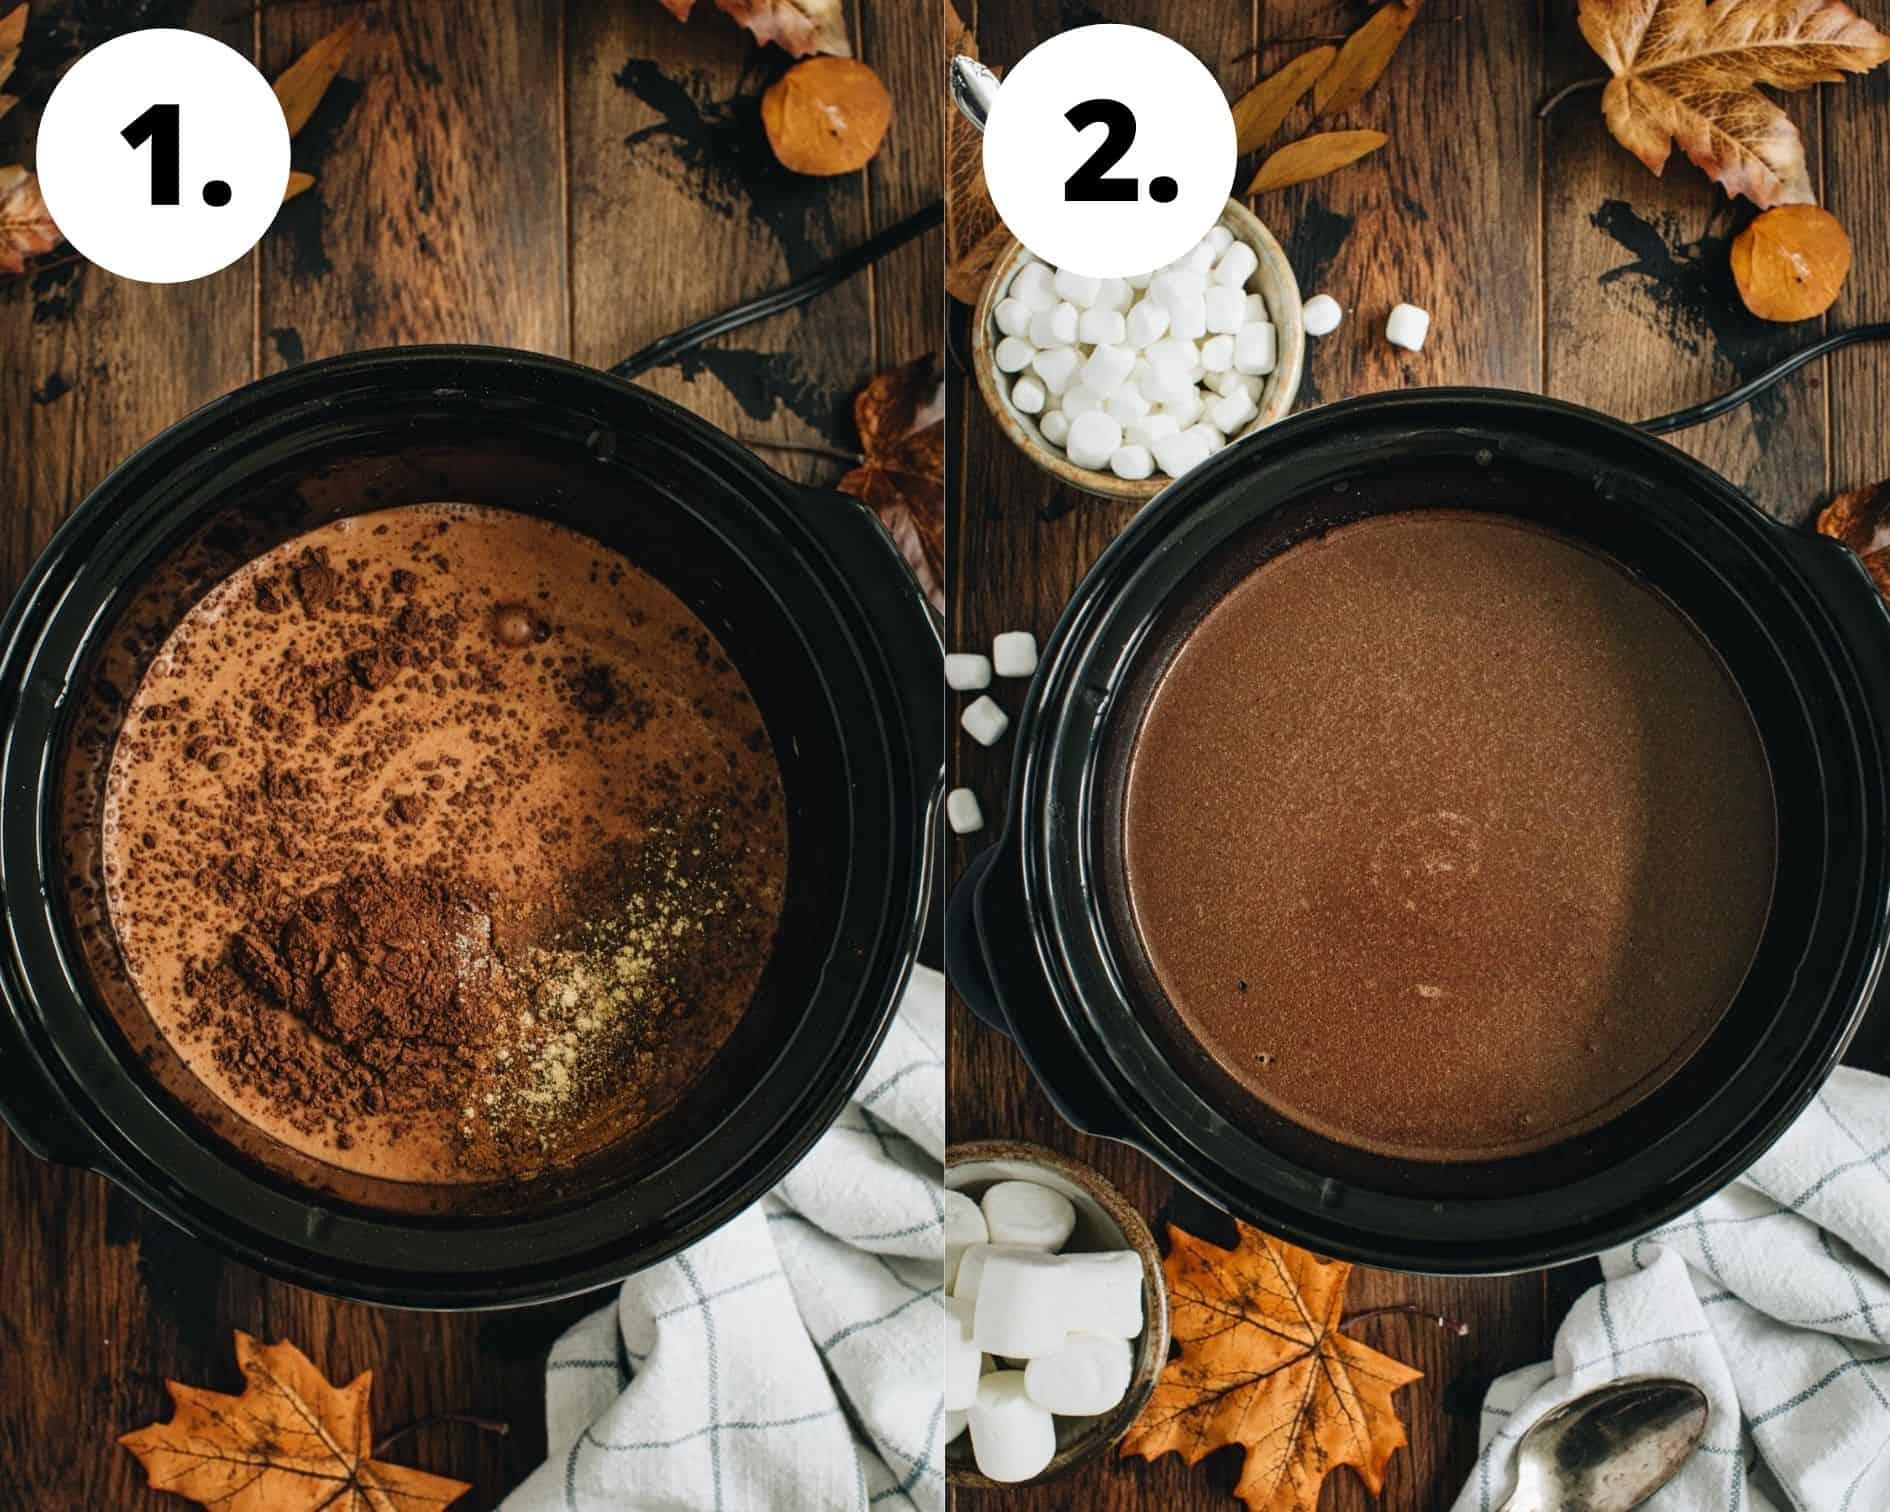 Pumpkin hot chocolate process steps 1 and 2.